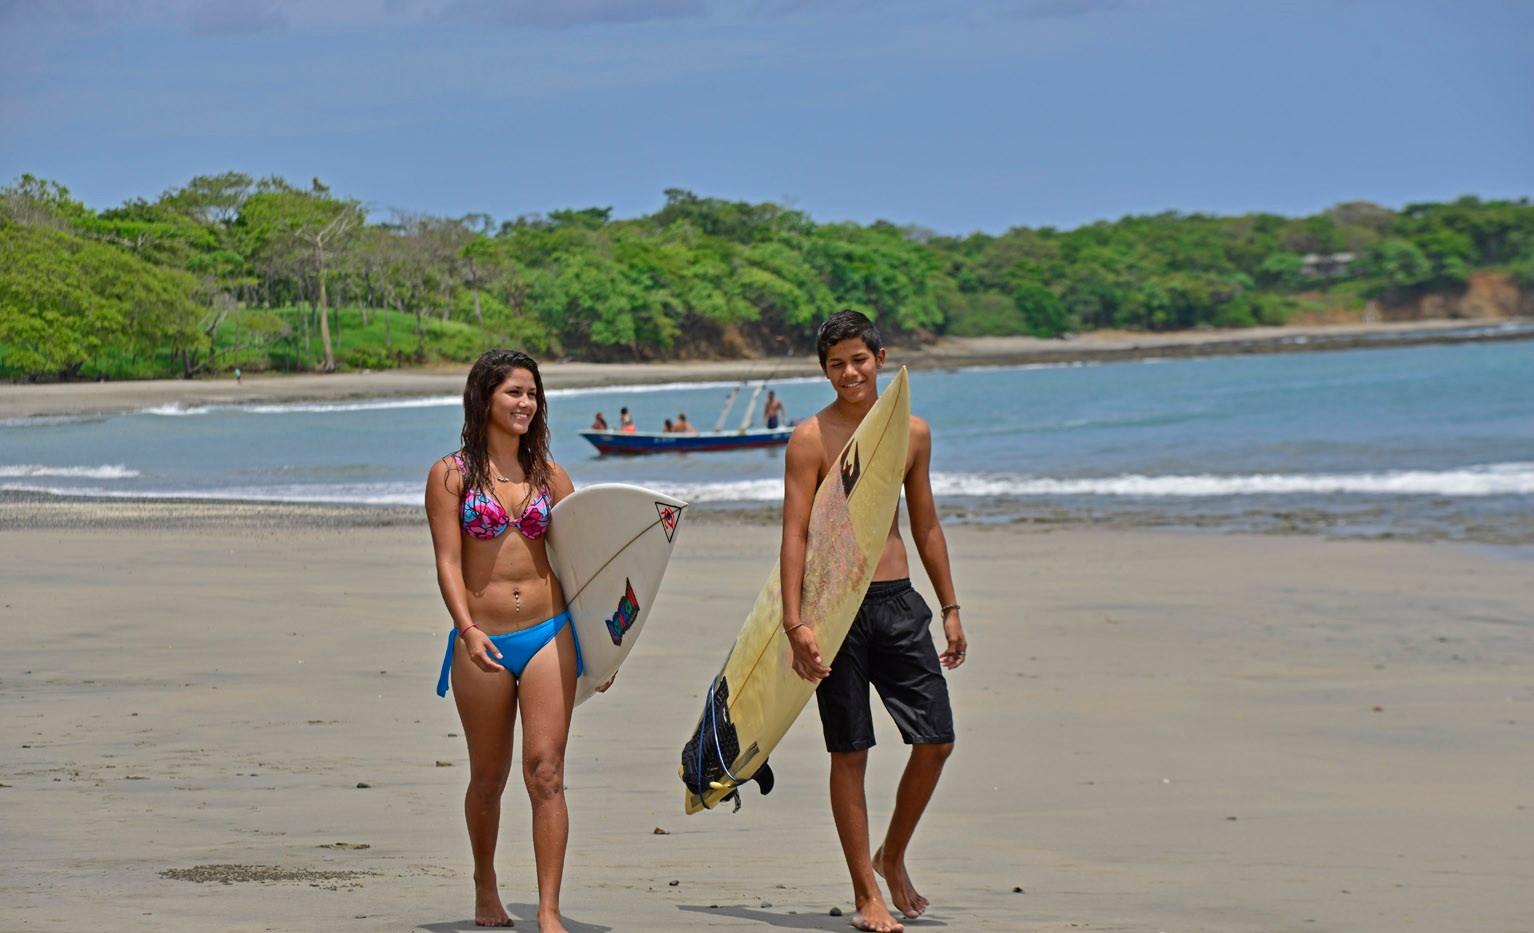 Surfing at Playa Lagarto.